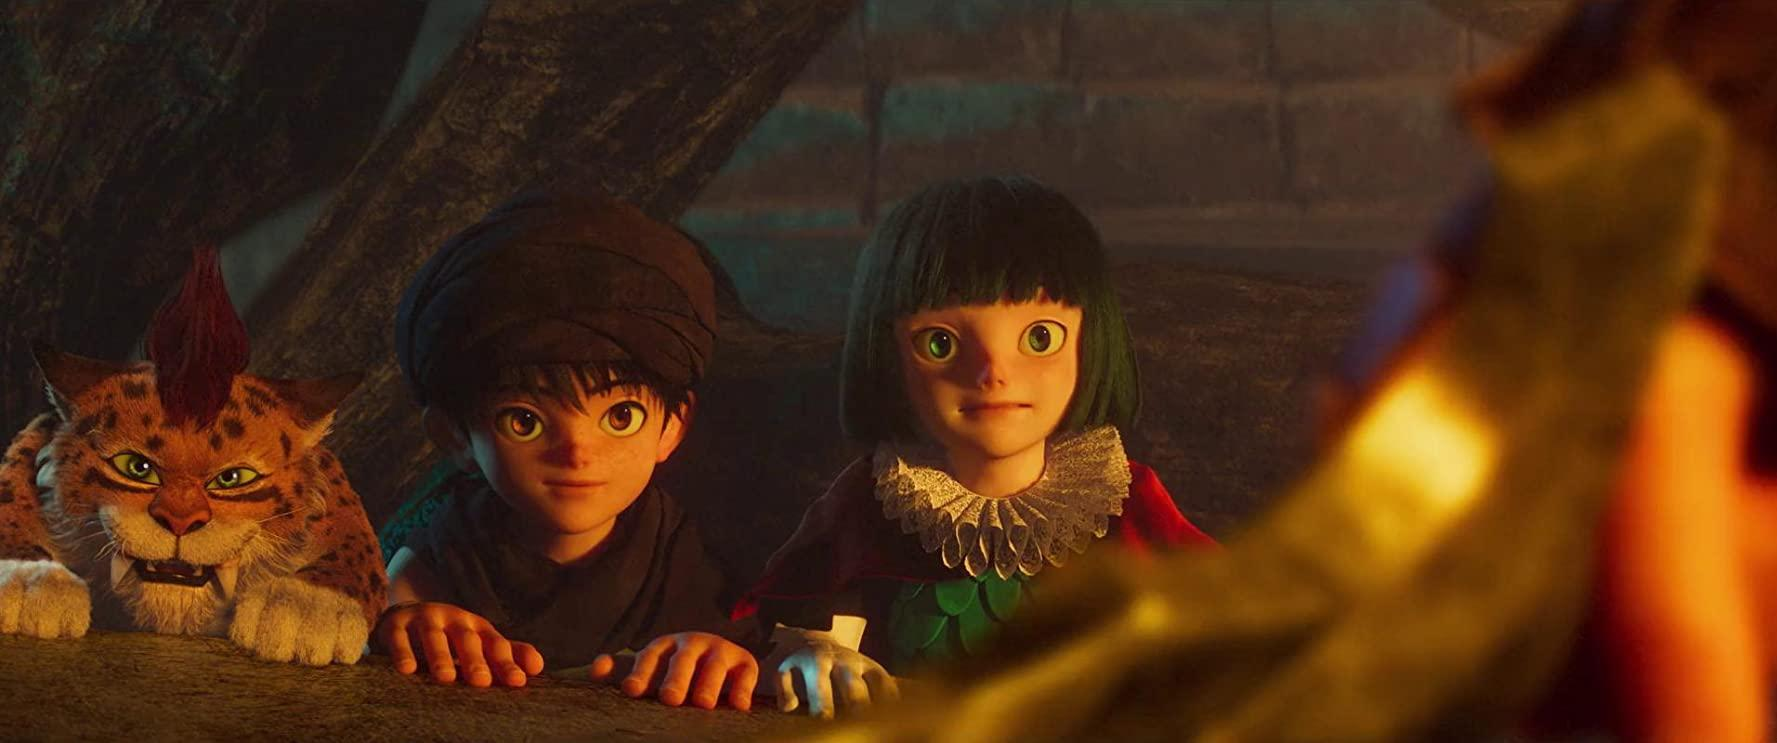 مشاهدة فيلم Dragon Quest Your Story (2020) مترجم HD اون لاين